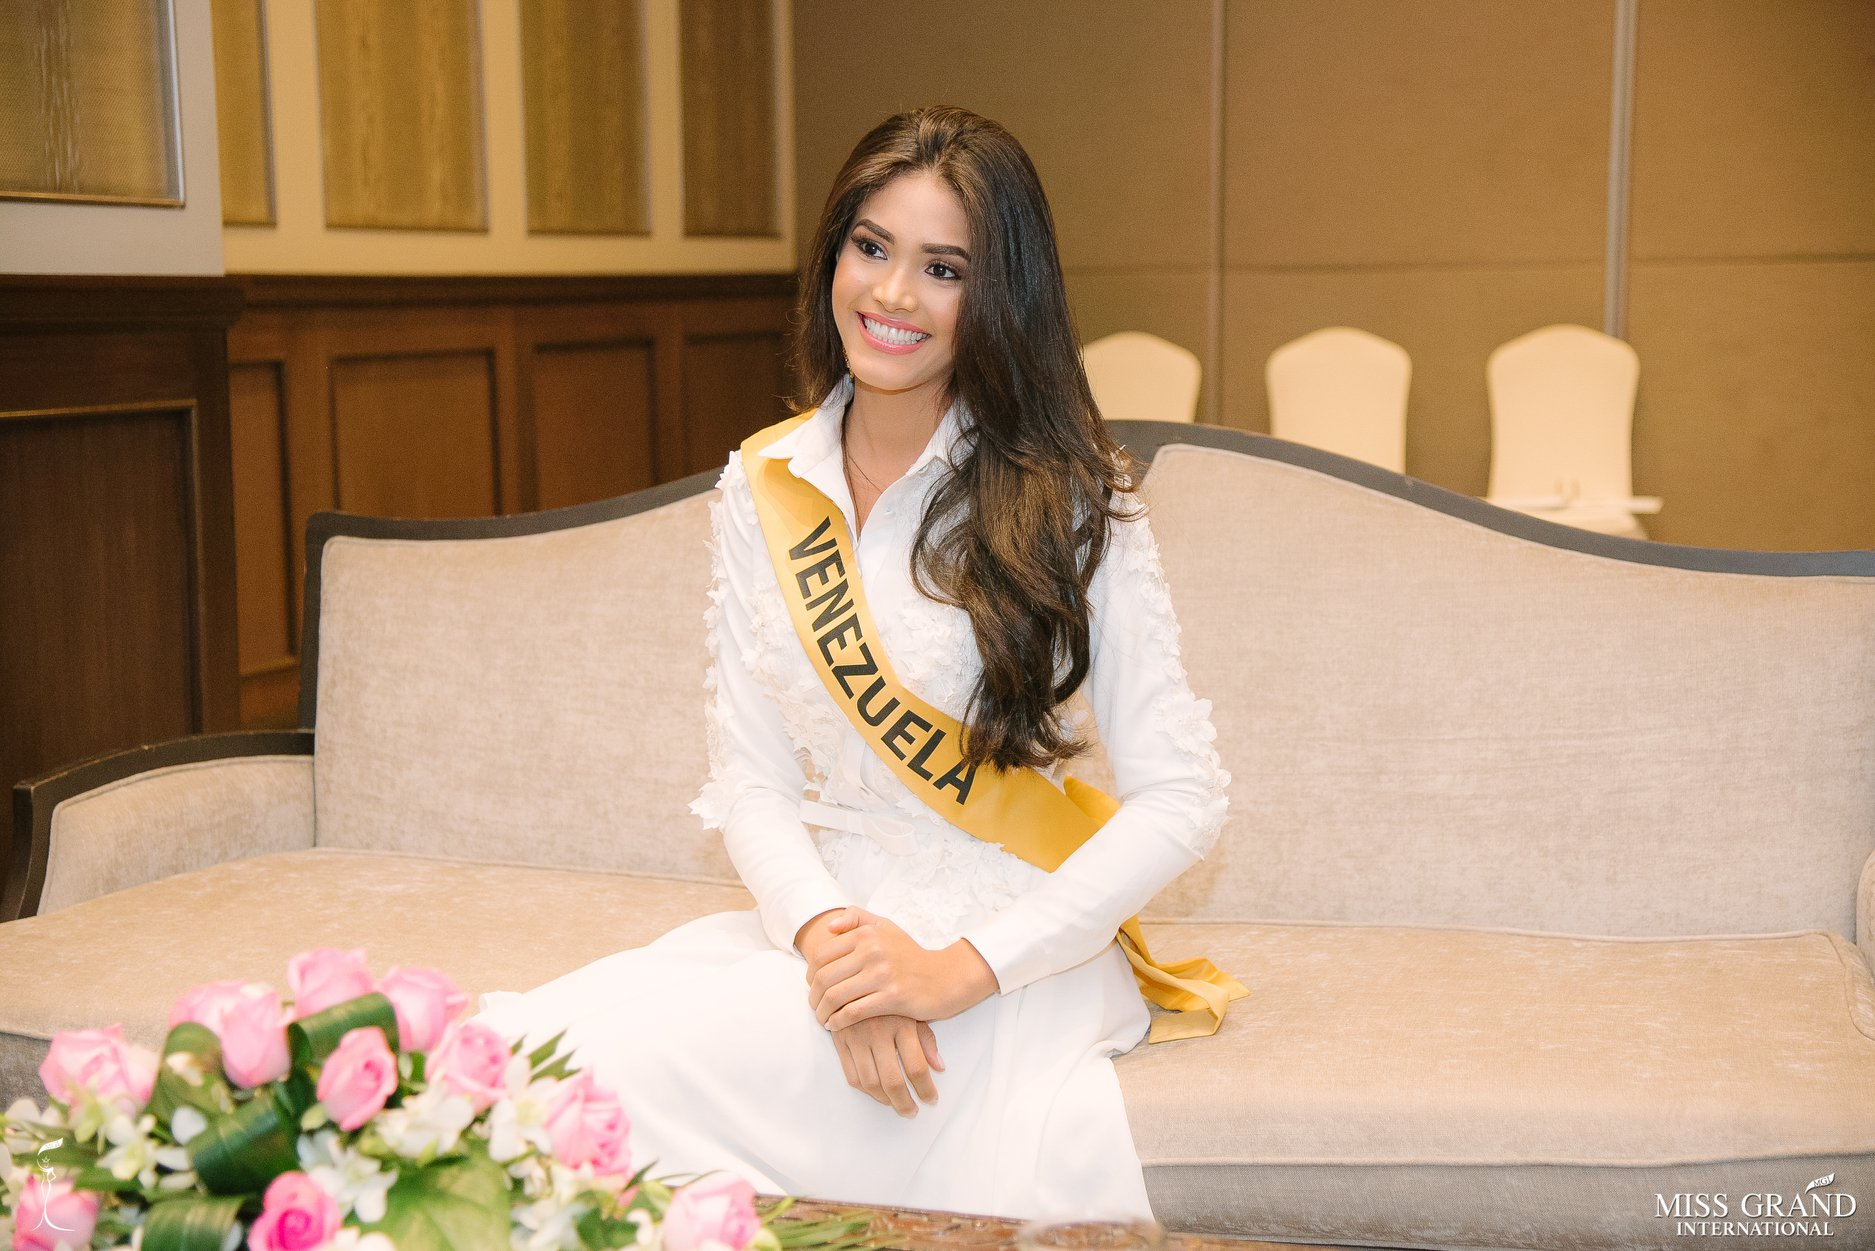 biliannis alvarez, top 10 de miss grand international 2018. - Página 10 Yzjsxw10